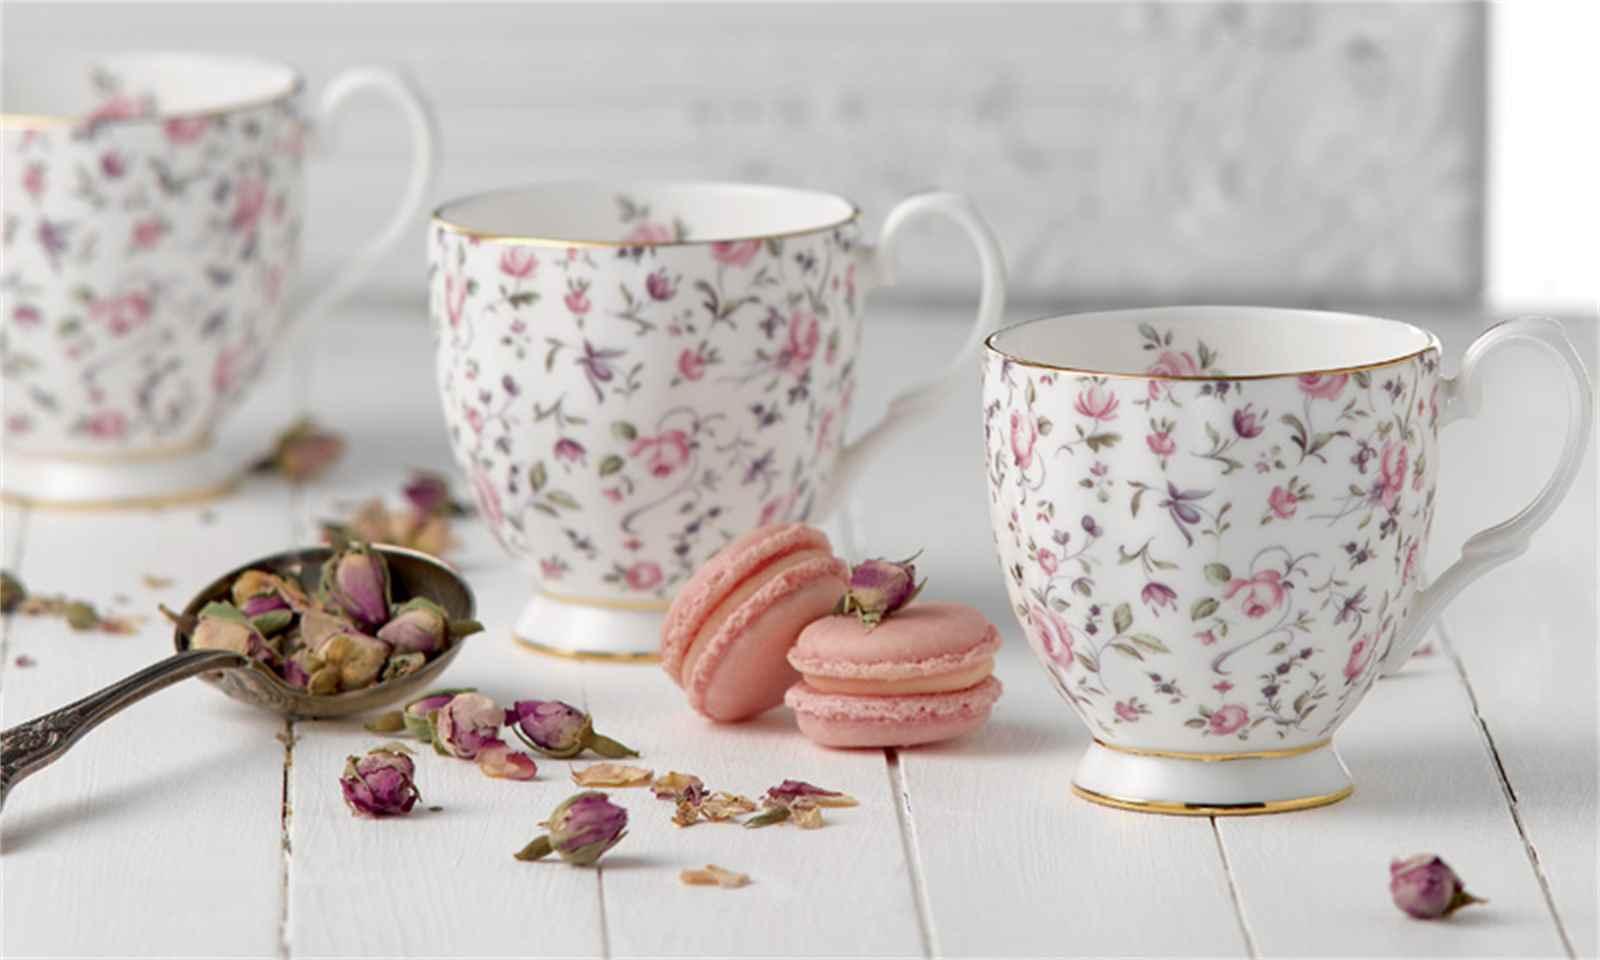 royal albert rose confetti купить посуду в Glavfish